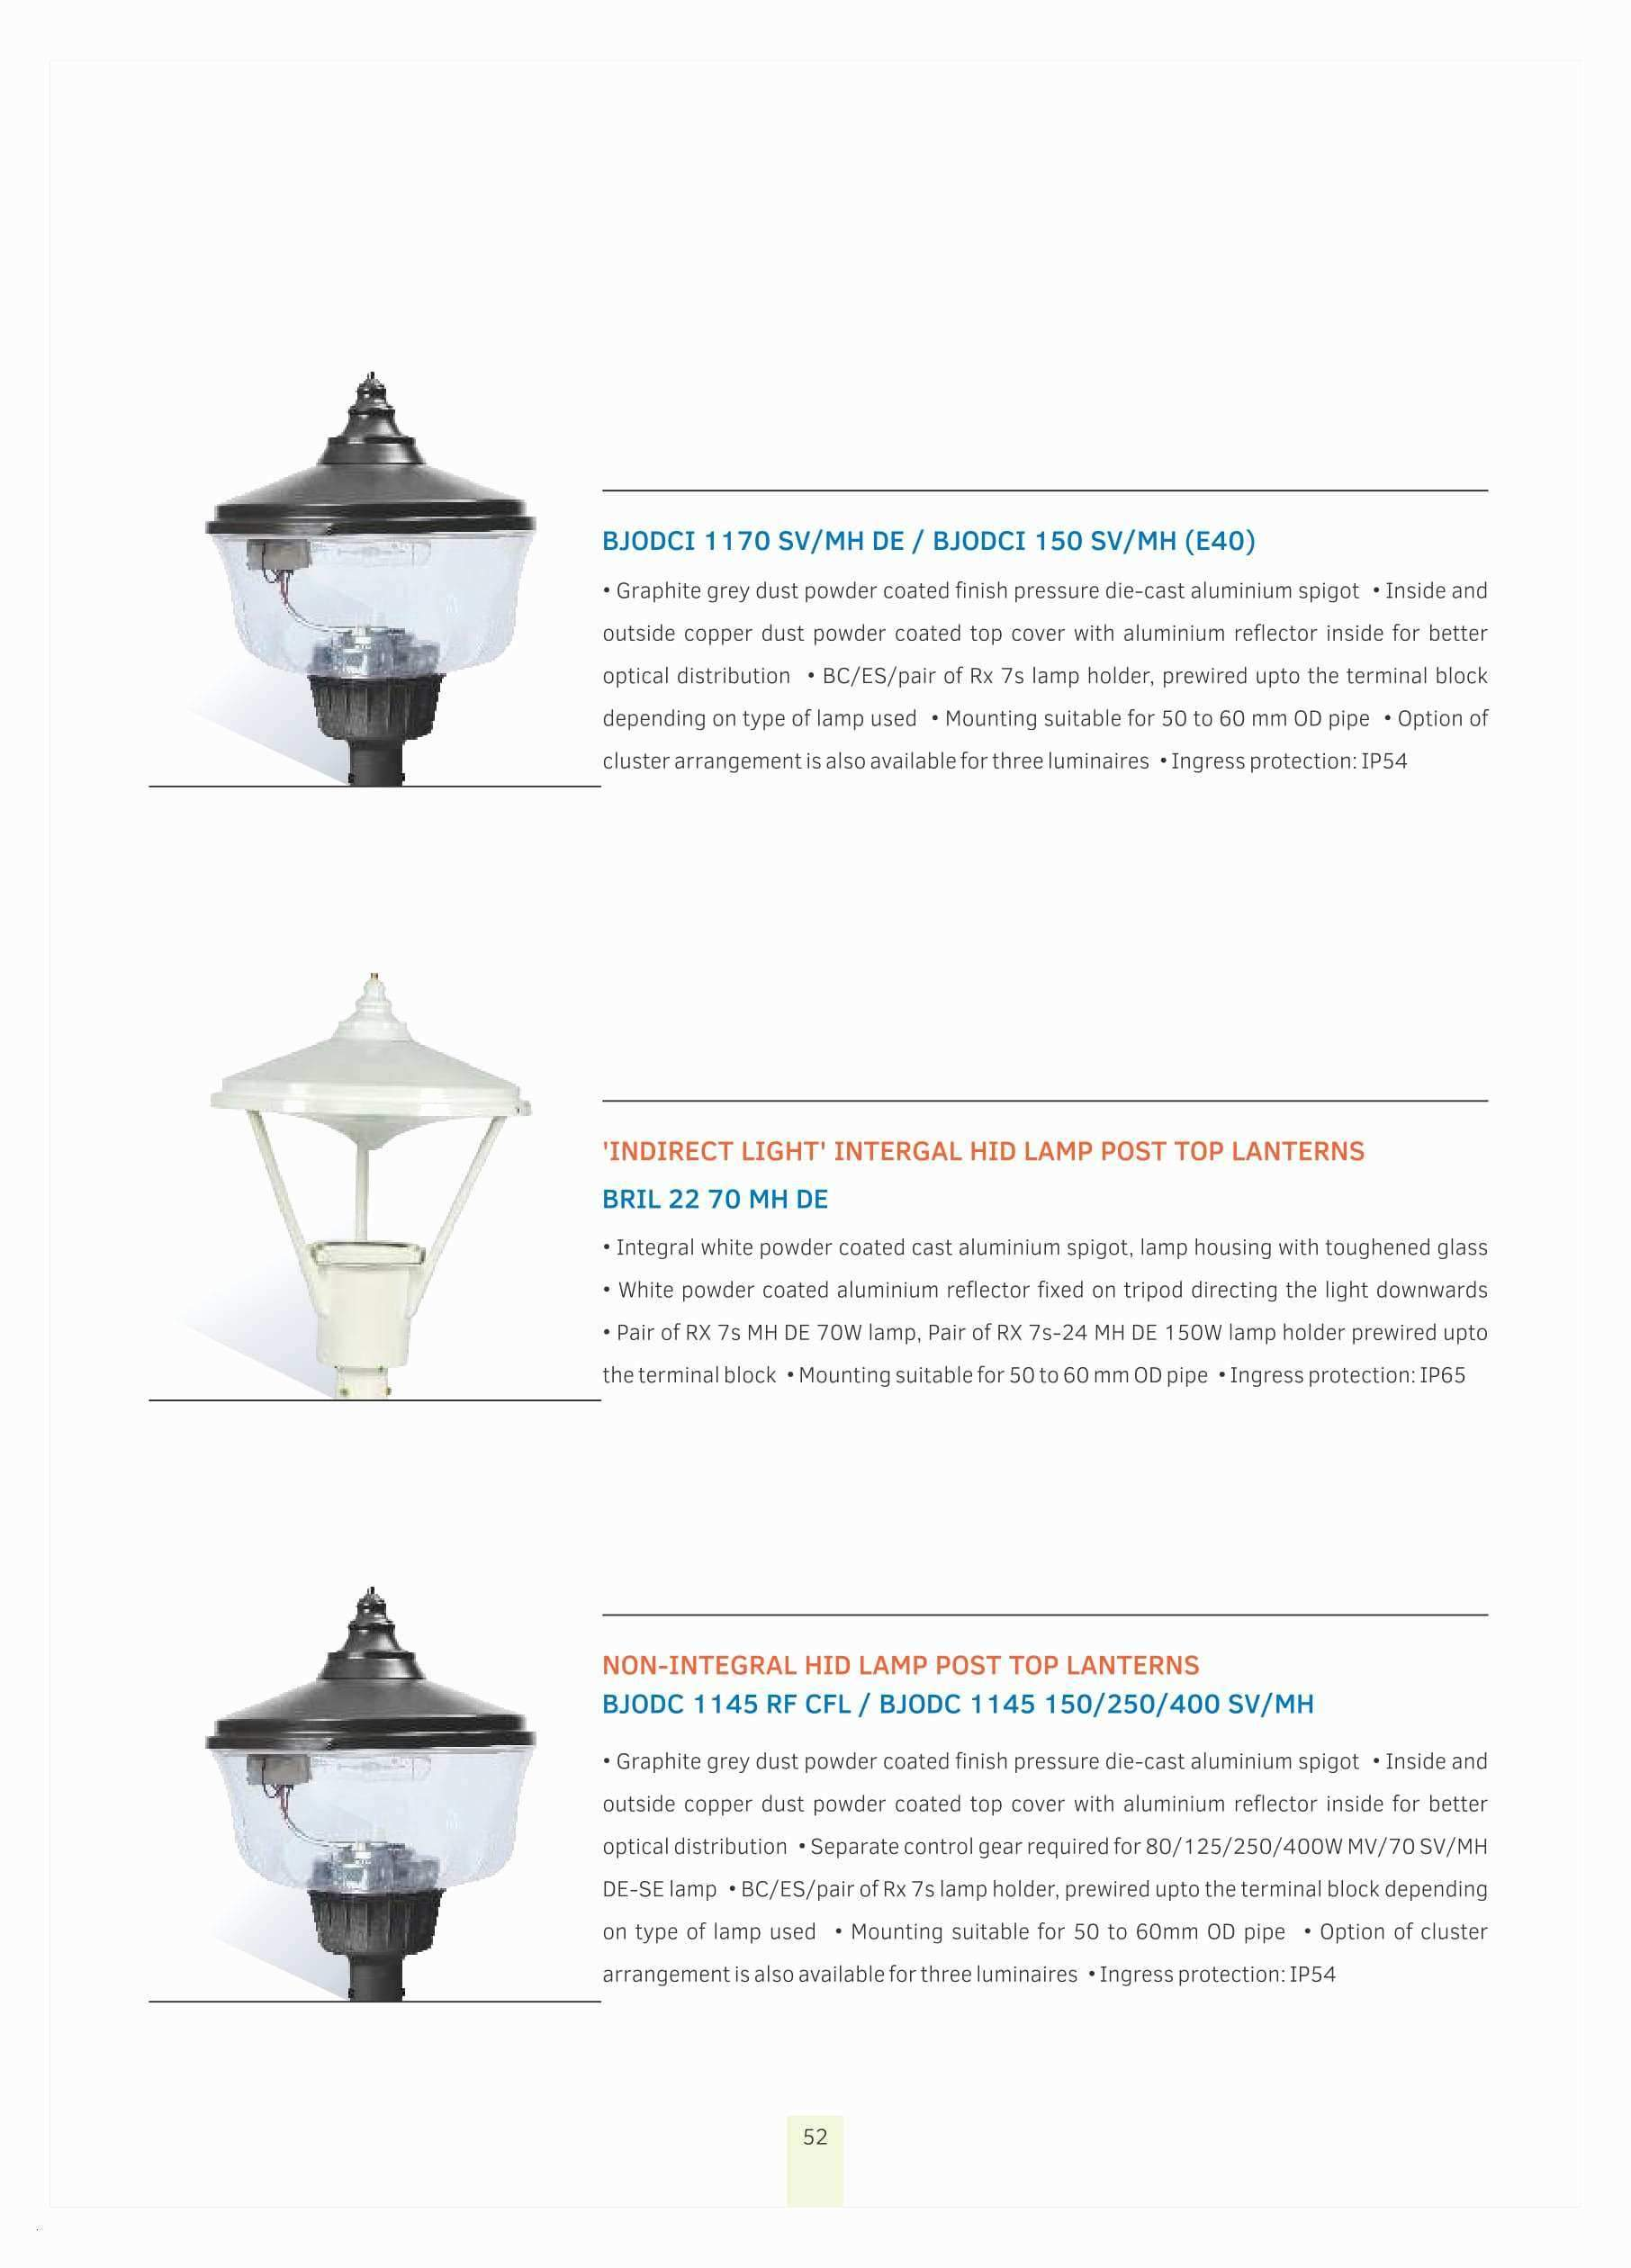 led lampen fur garten luxus outdoor lampen garten genial outdoor landscape led lighting of led lampen fur garten